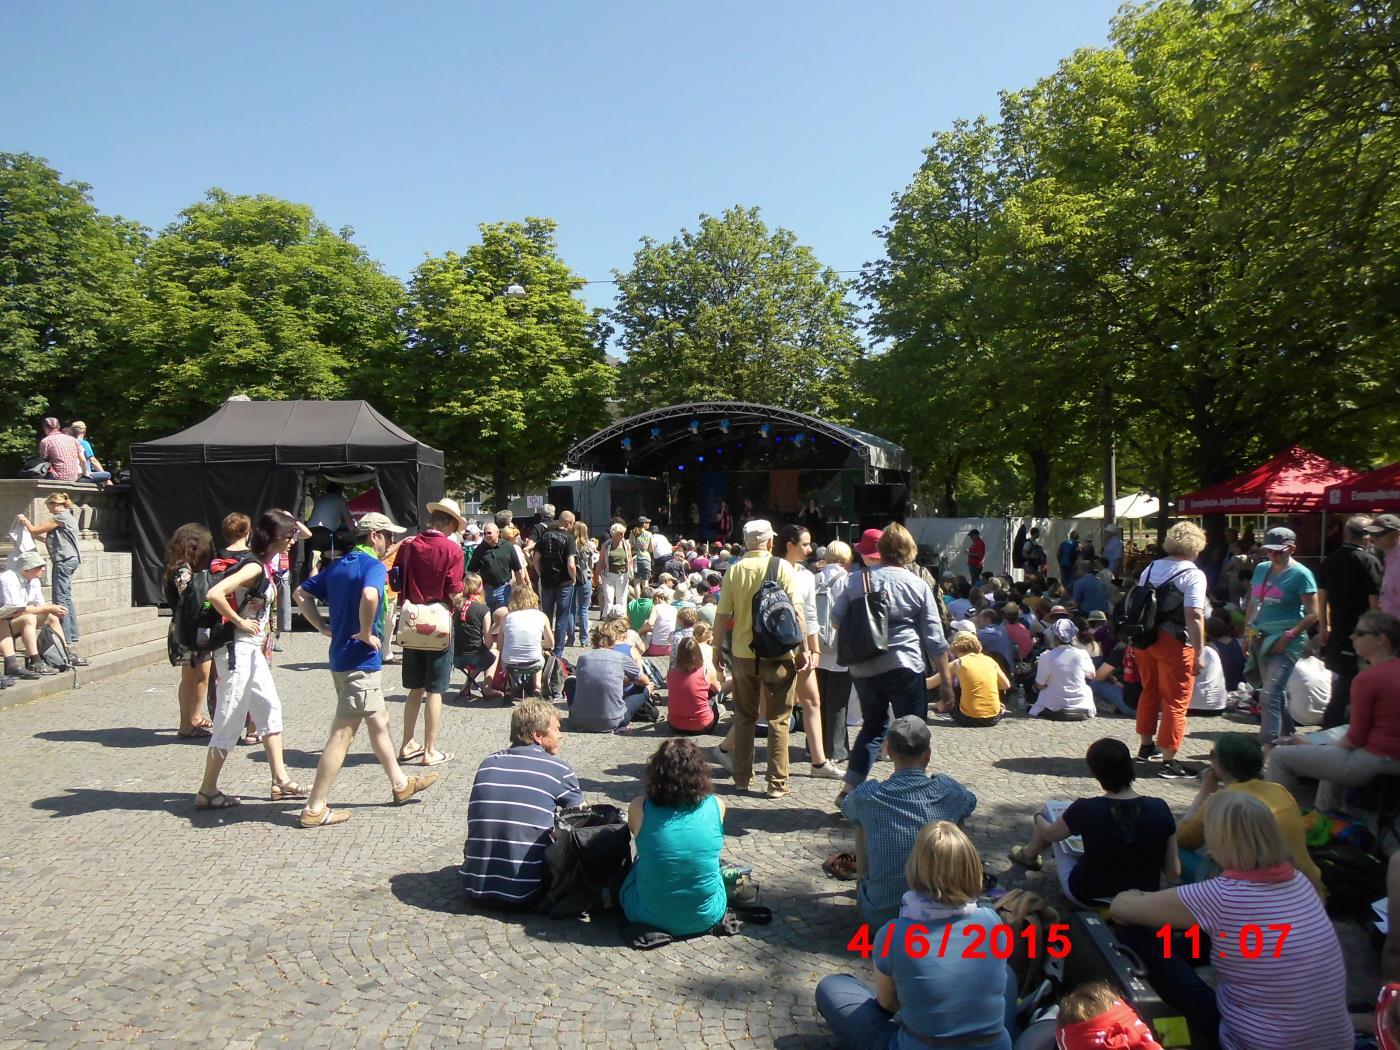 Kirchentag Stuttgart - Police react nervously